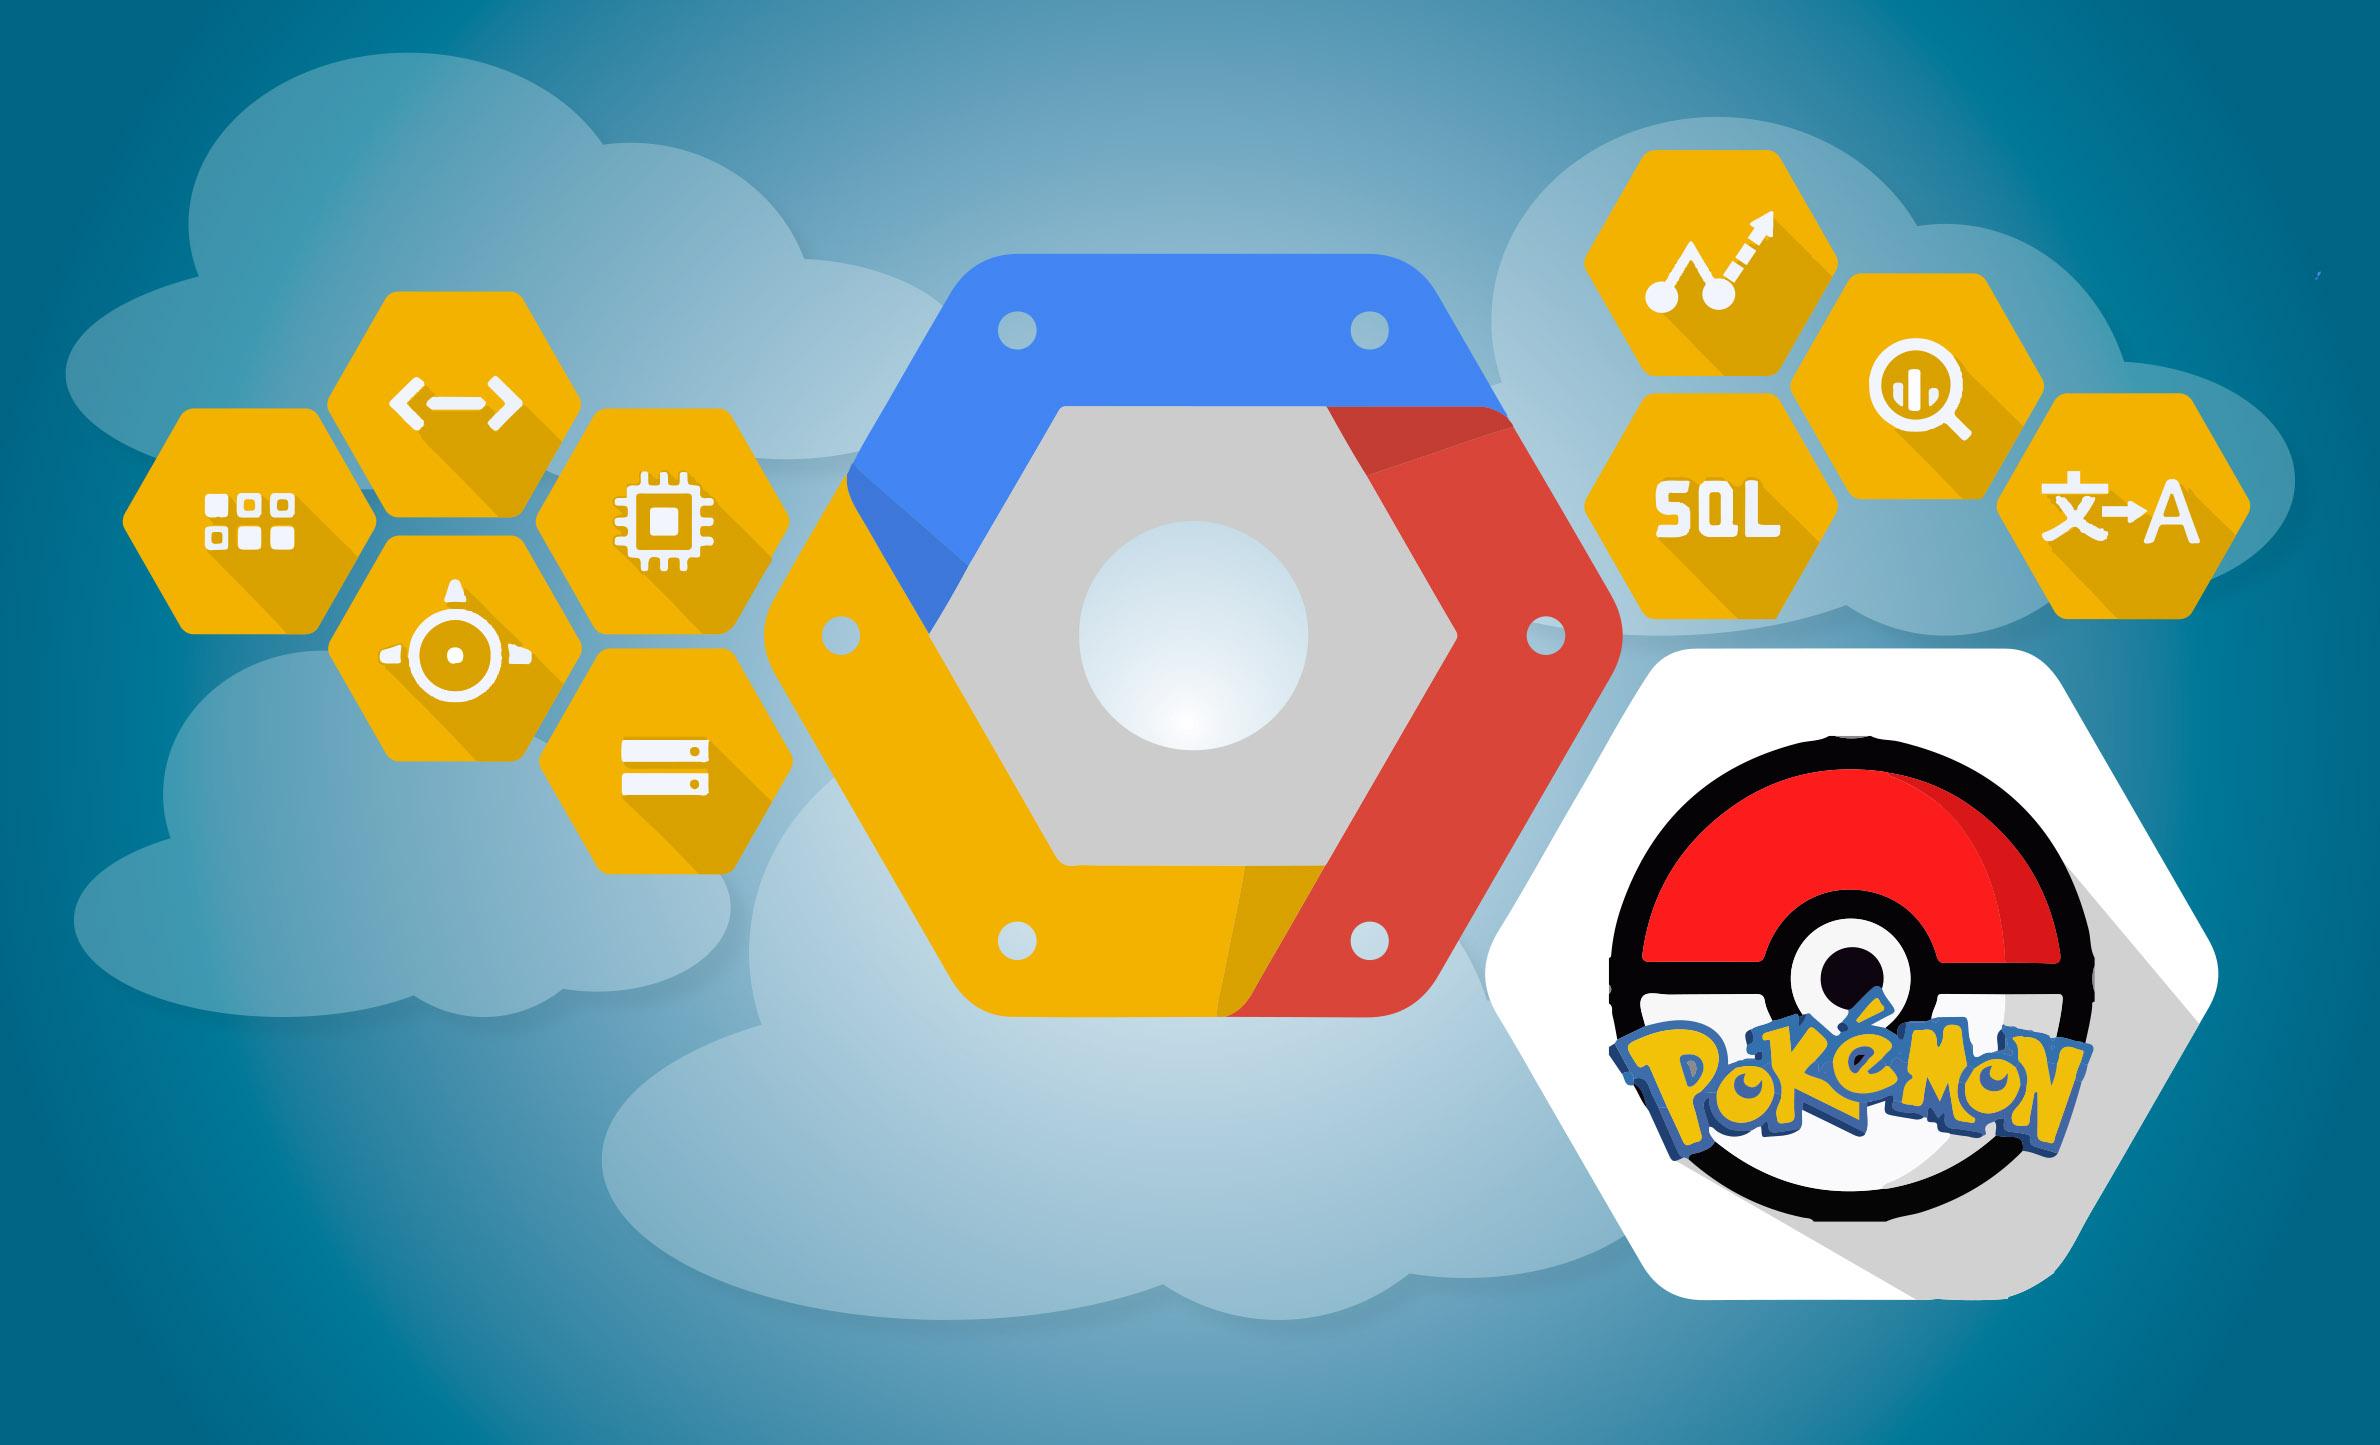 Why we use the same Google Cloud Platform as Pokémon GO